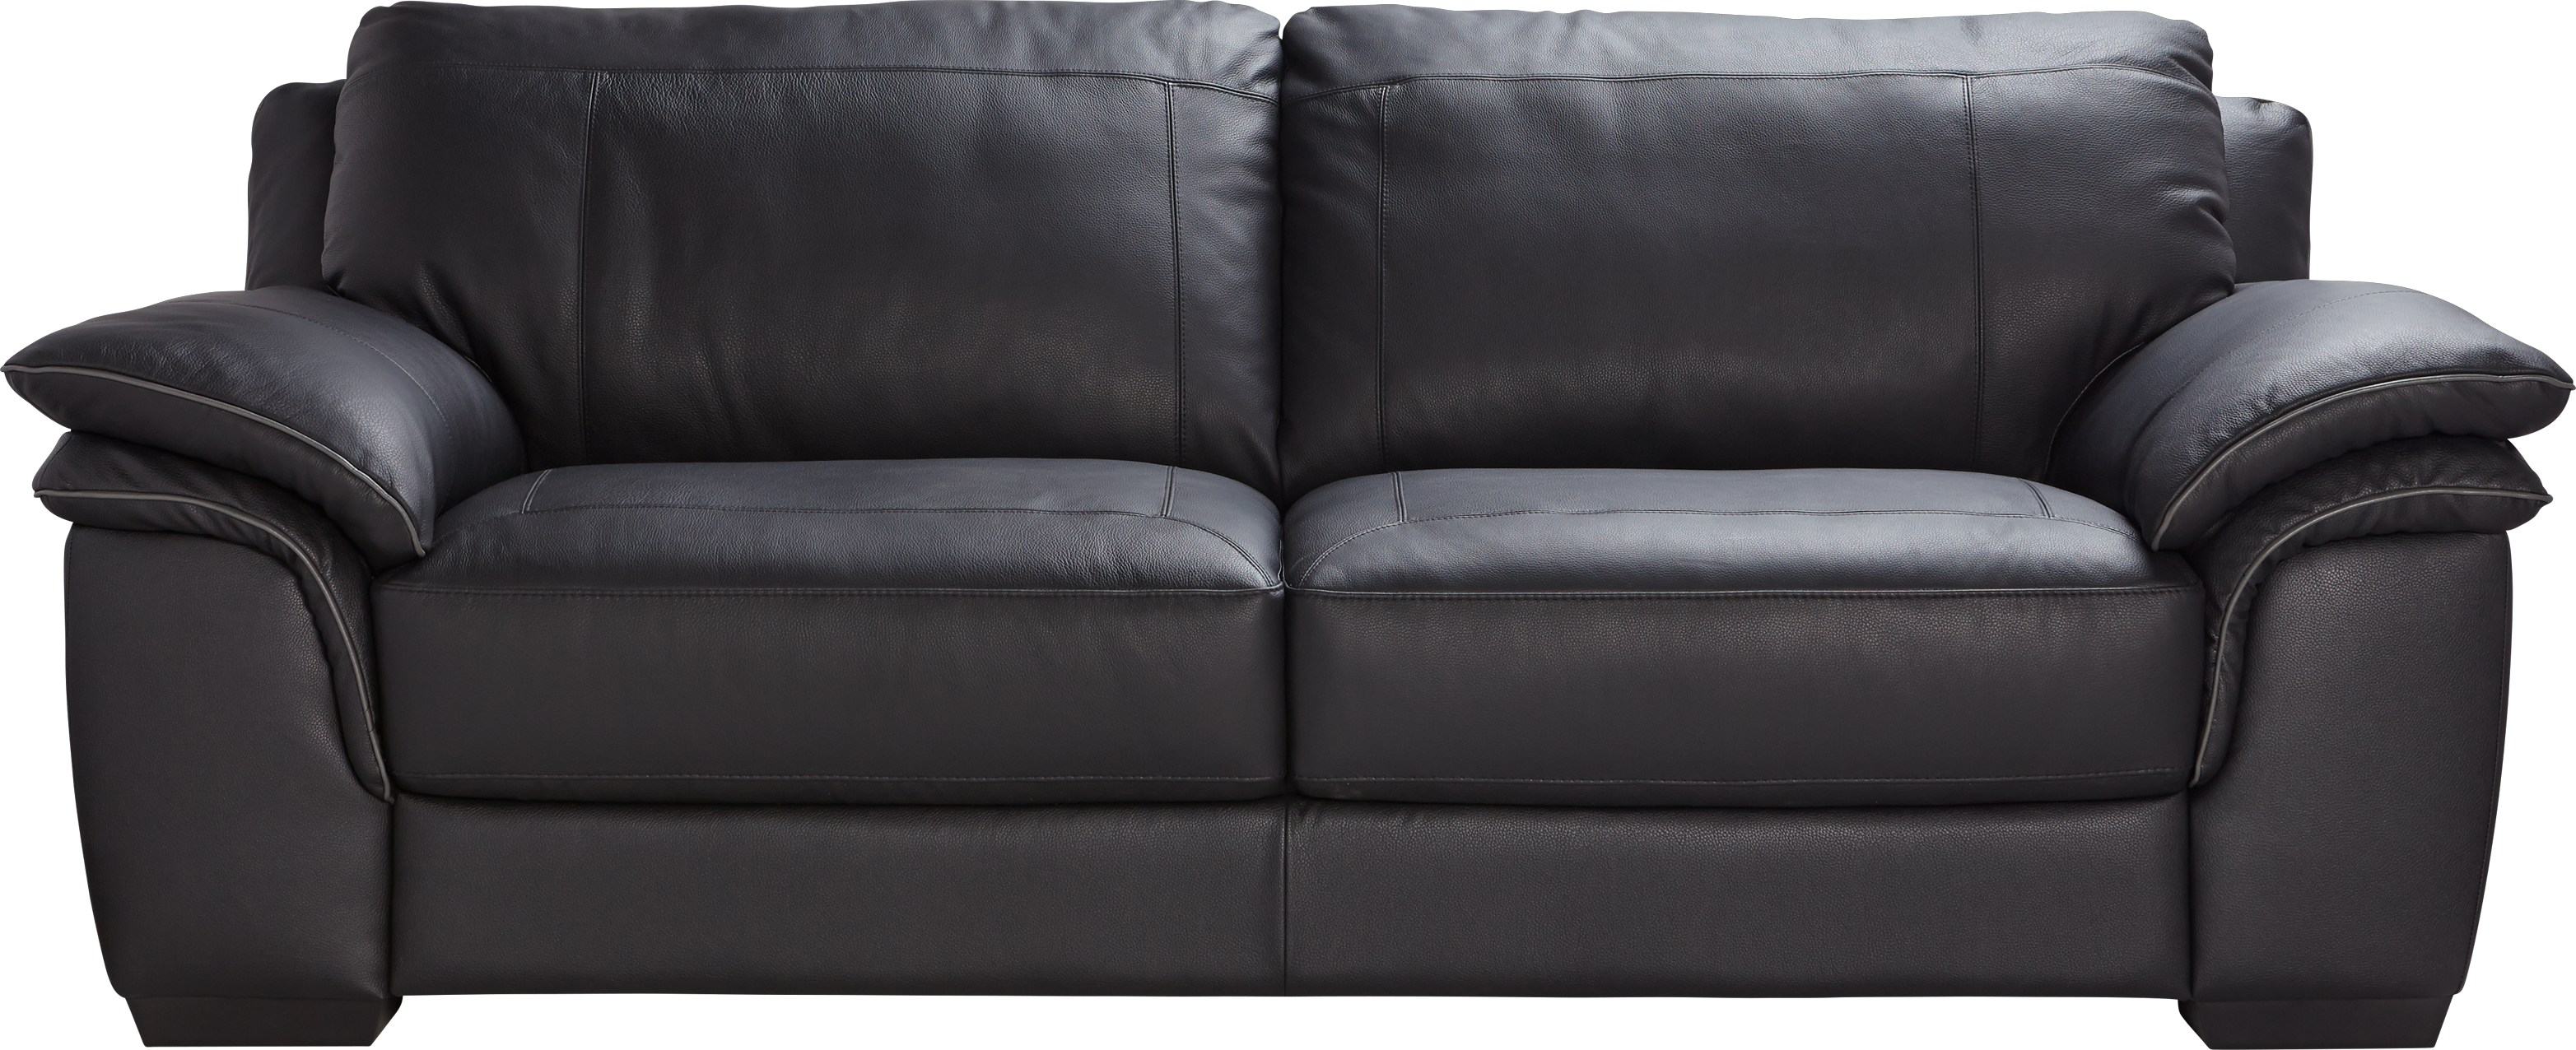 Cindy Crawford Home Grand Palazzo Black Leather Sofa - Leather Sofas (Black)